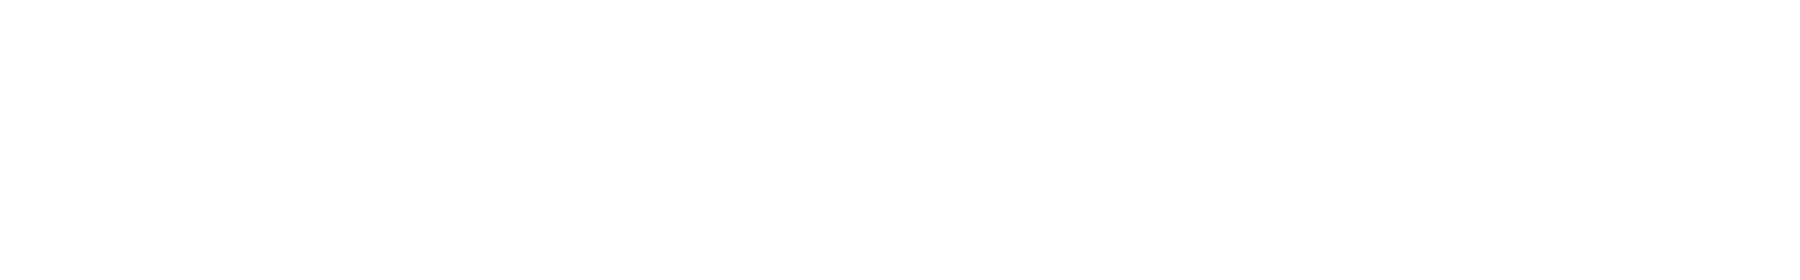 monophonic bass